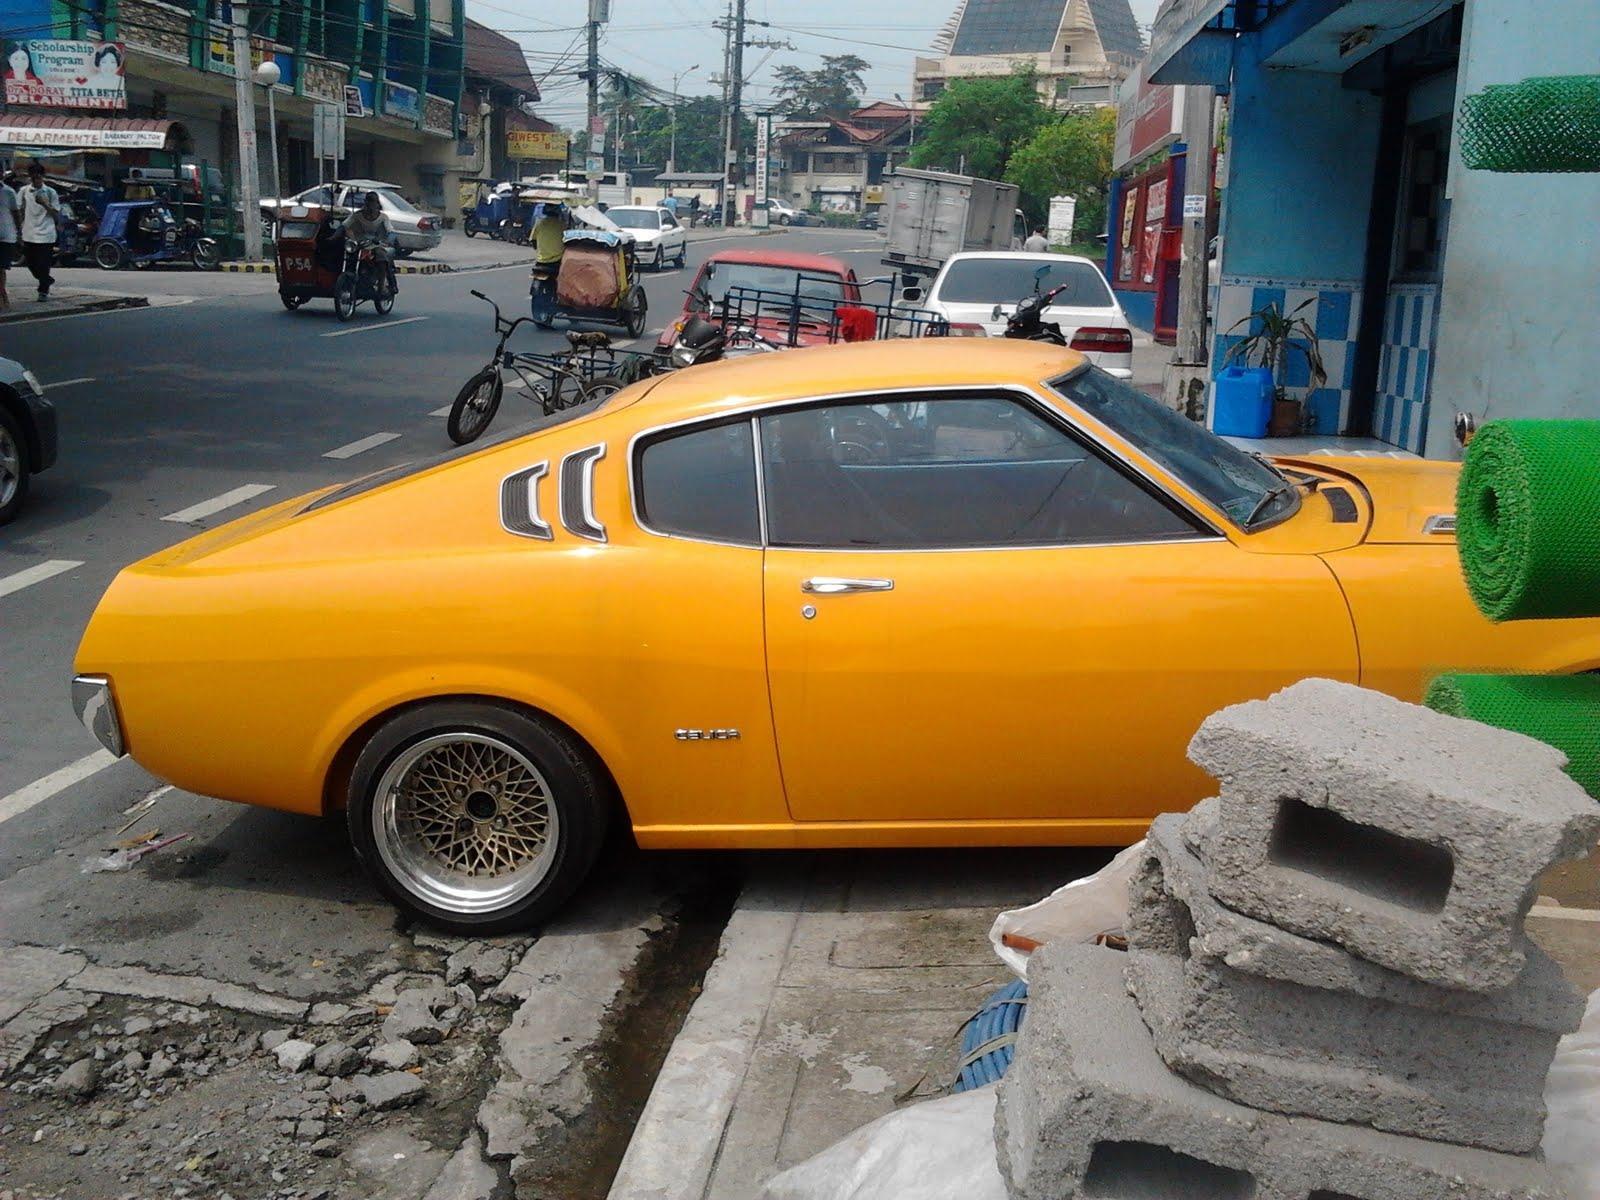 Parked Cars Manila: 1977 Toyota Celica Fastback